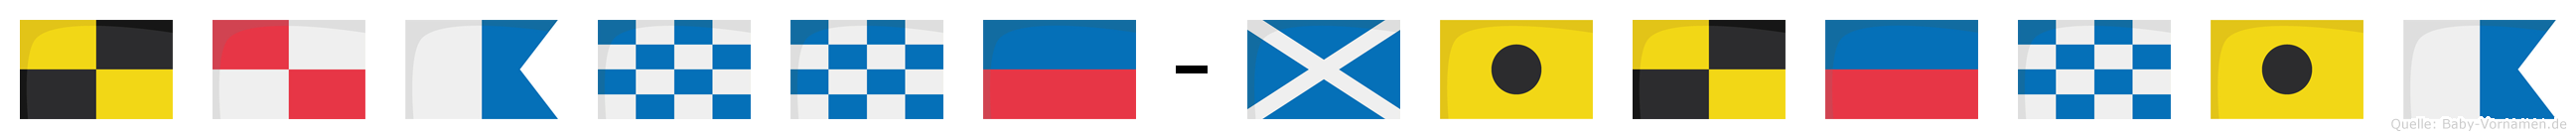 Luanne-Milenia im Flaggenalphabet